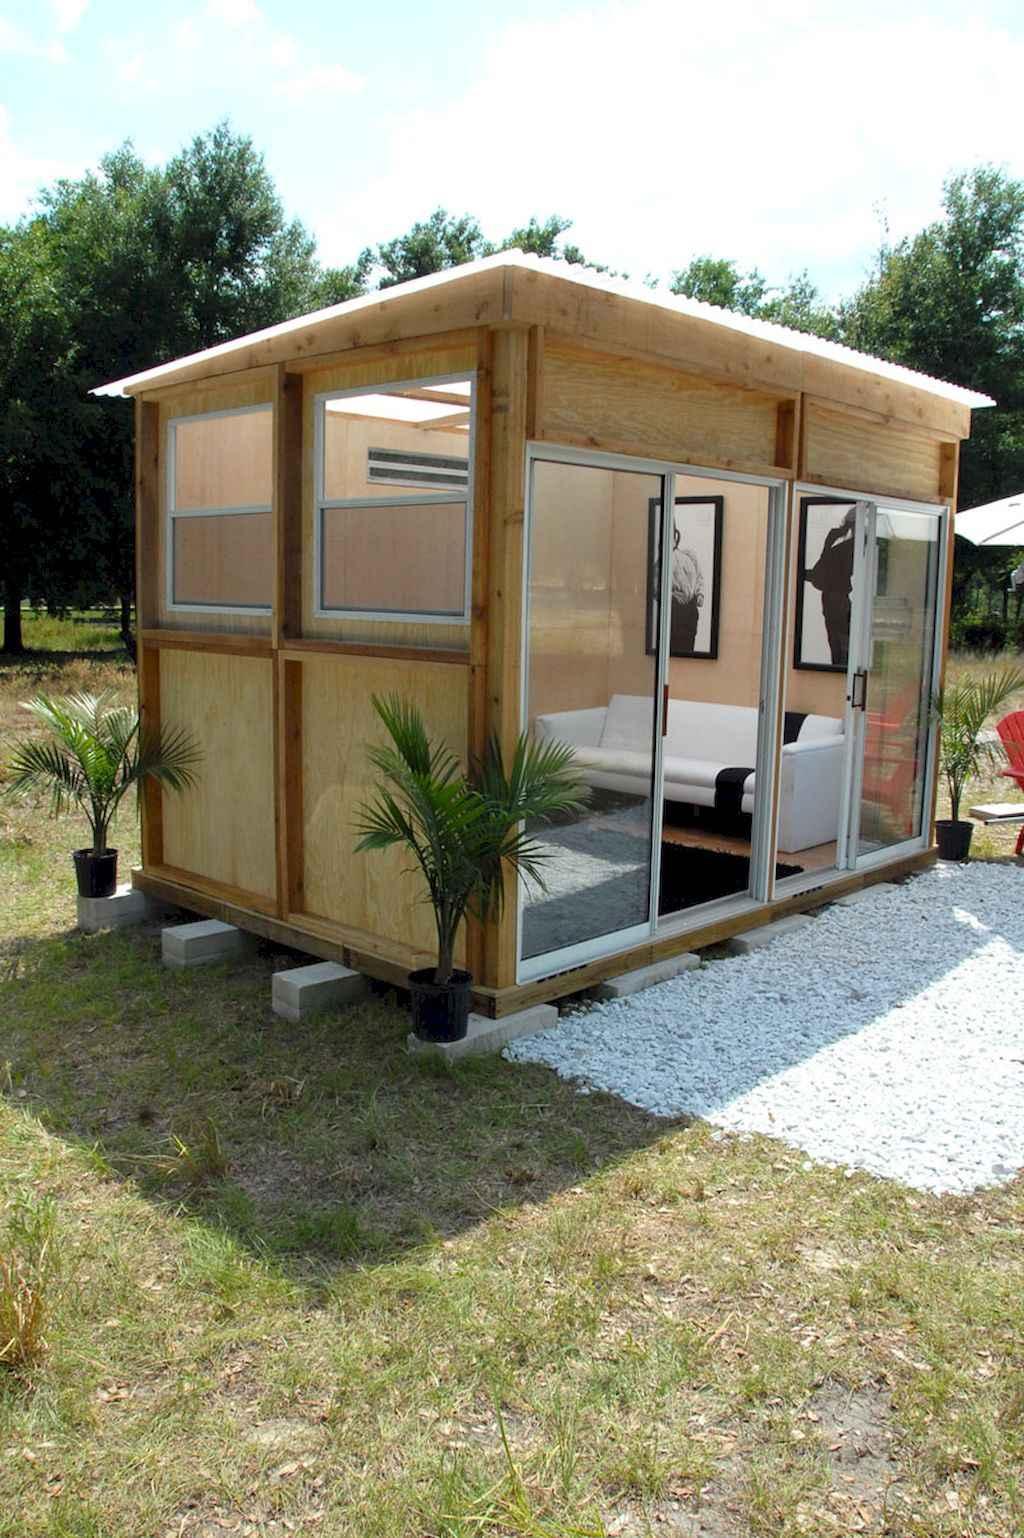 Cool diy backyard studio shed remodel design & decor ideas (26)